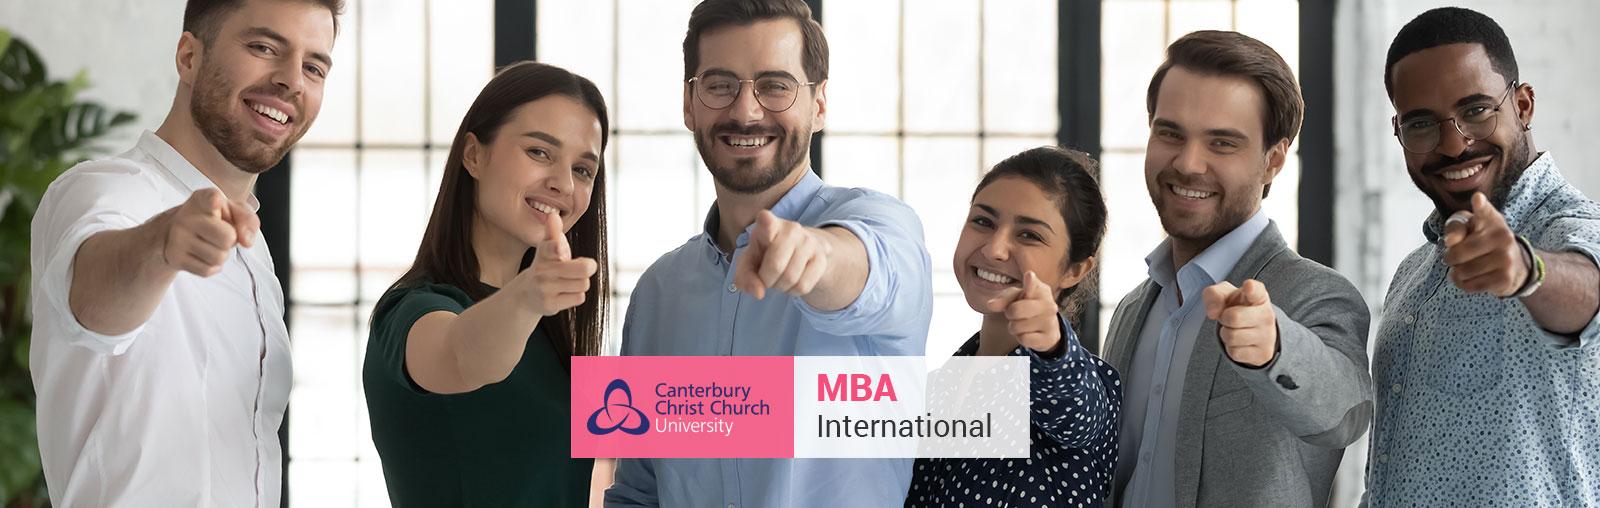 MBA International | CCCU